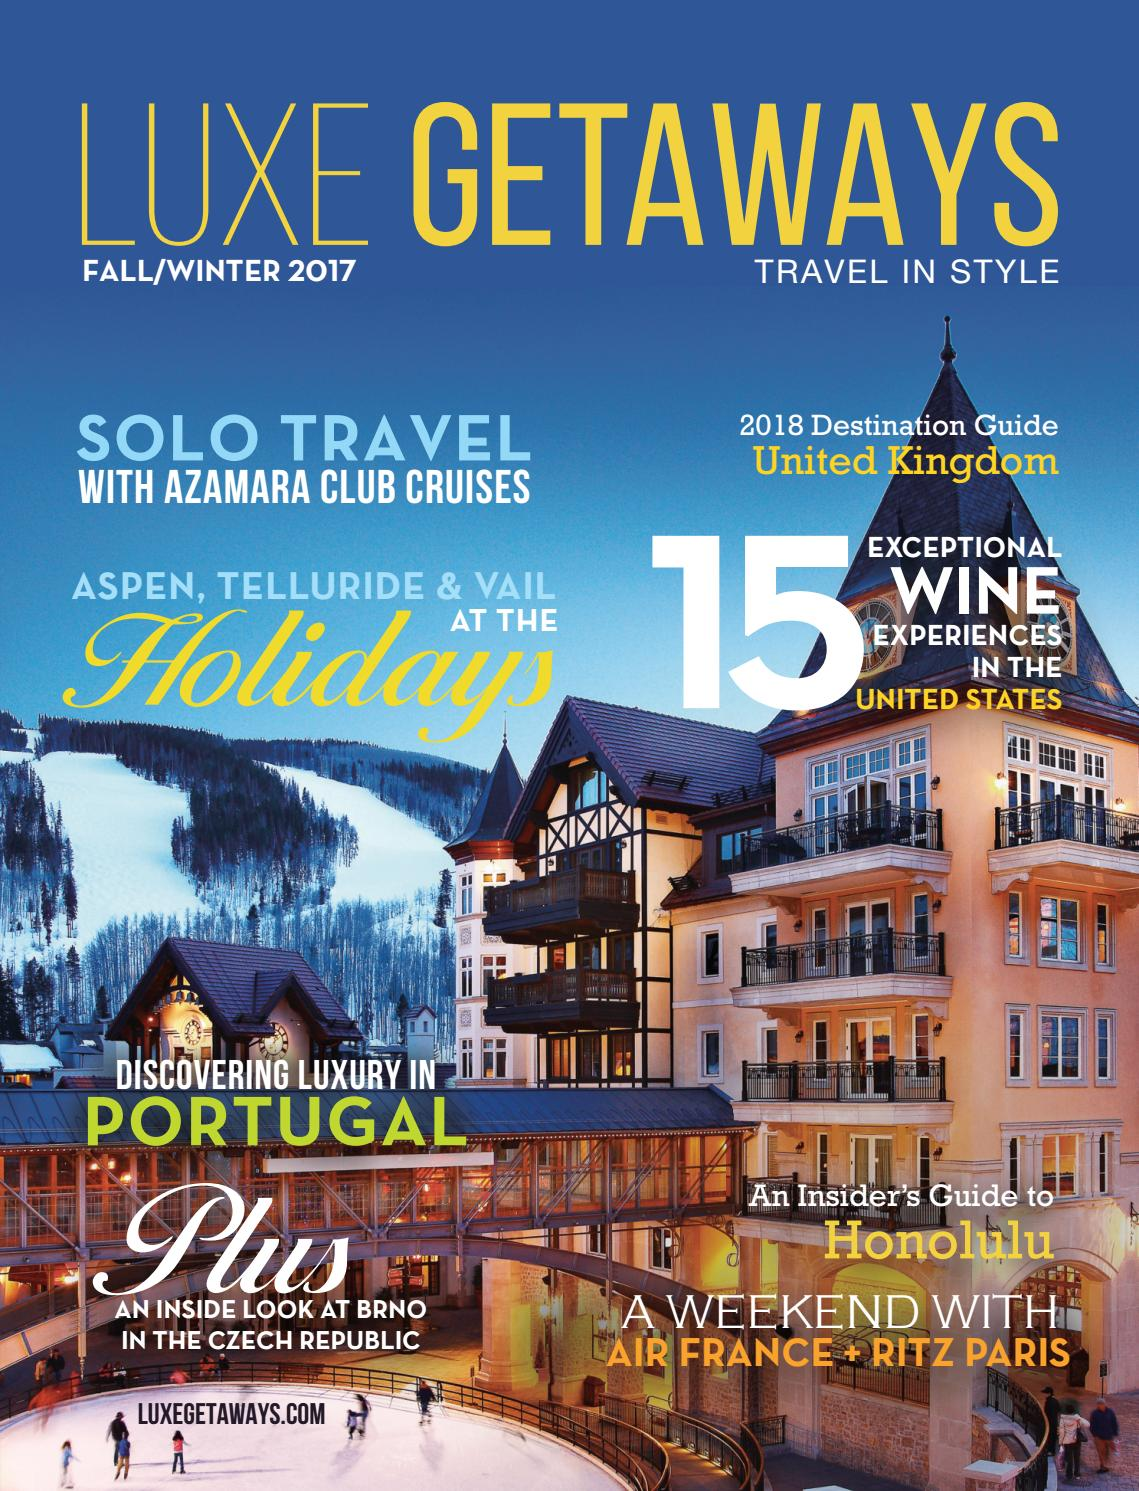 LuxeGetaways Fall/Winter 2017 by LuxeGetaways Magazine - issuu